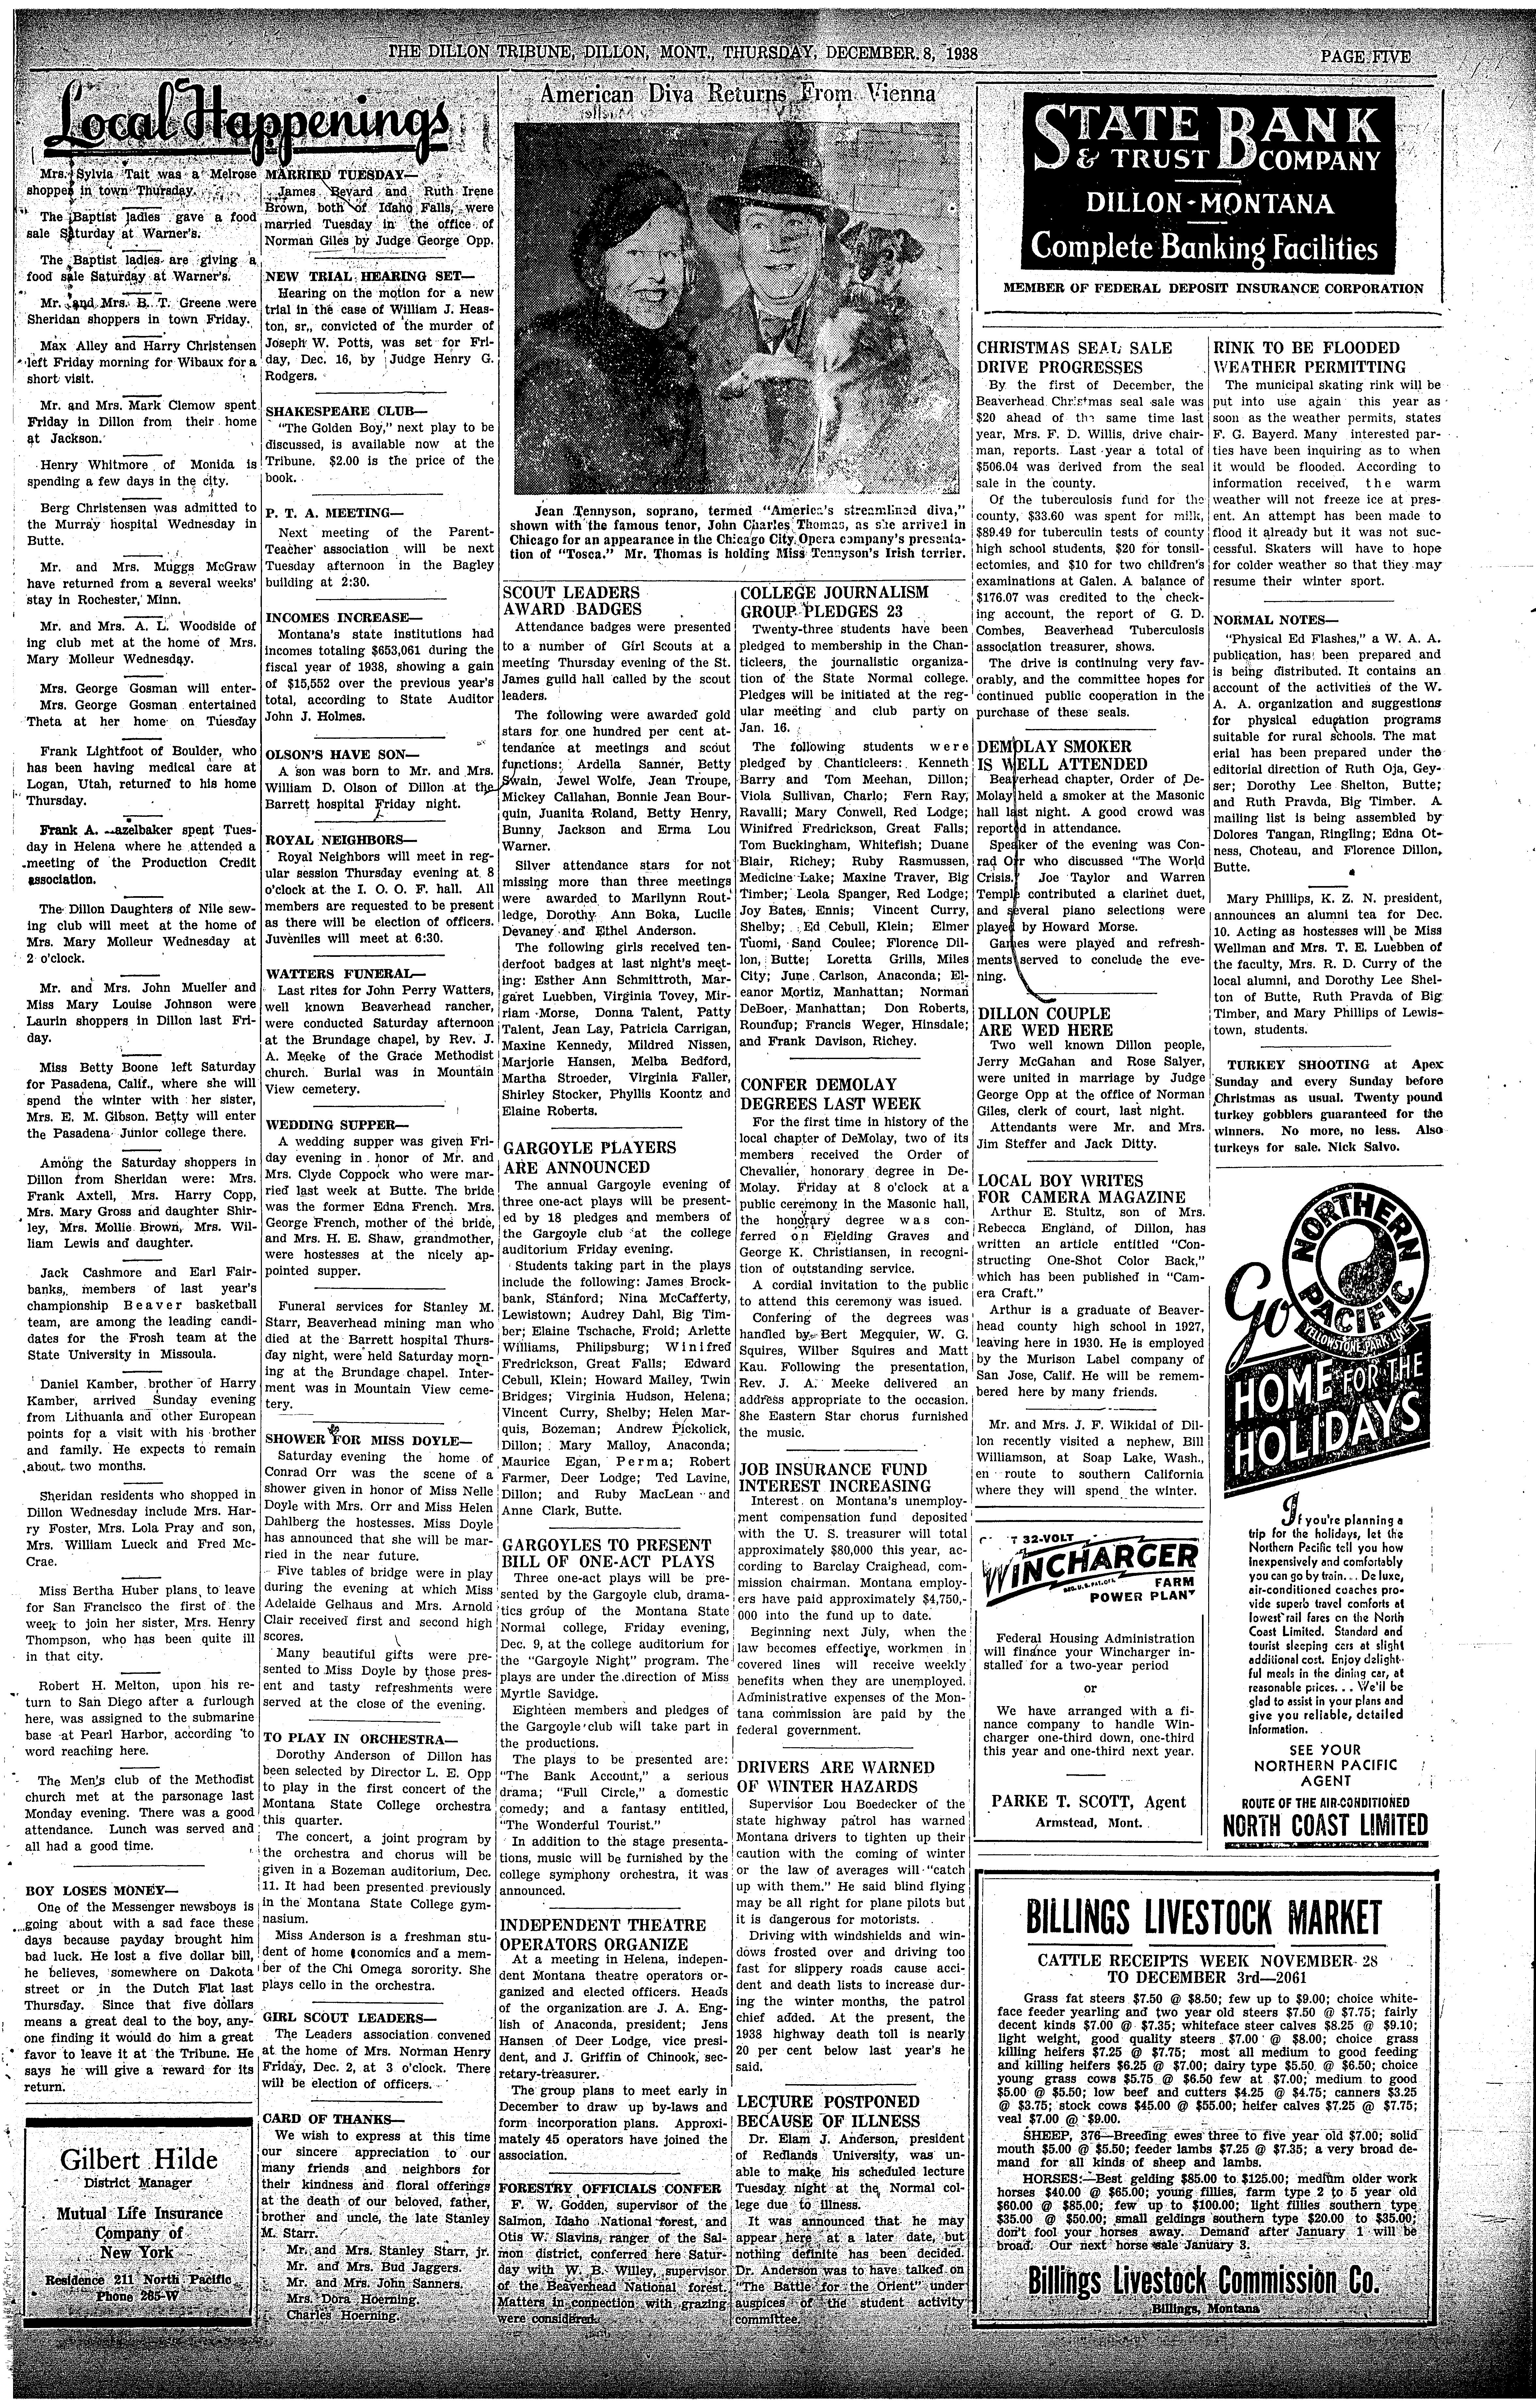 The Dillon Tribune (Dillon, Mont.) 1881-1941, December 08, 1938 ...